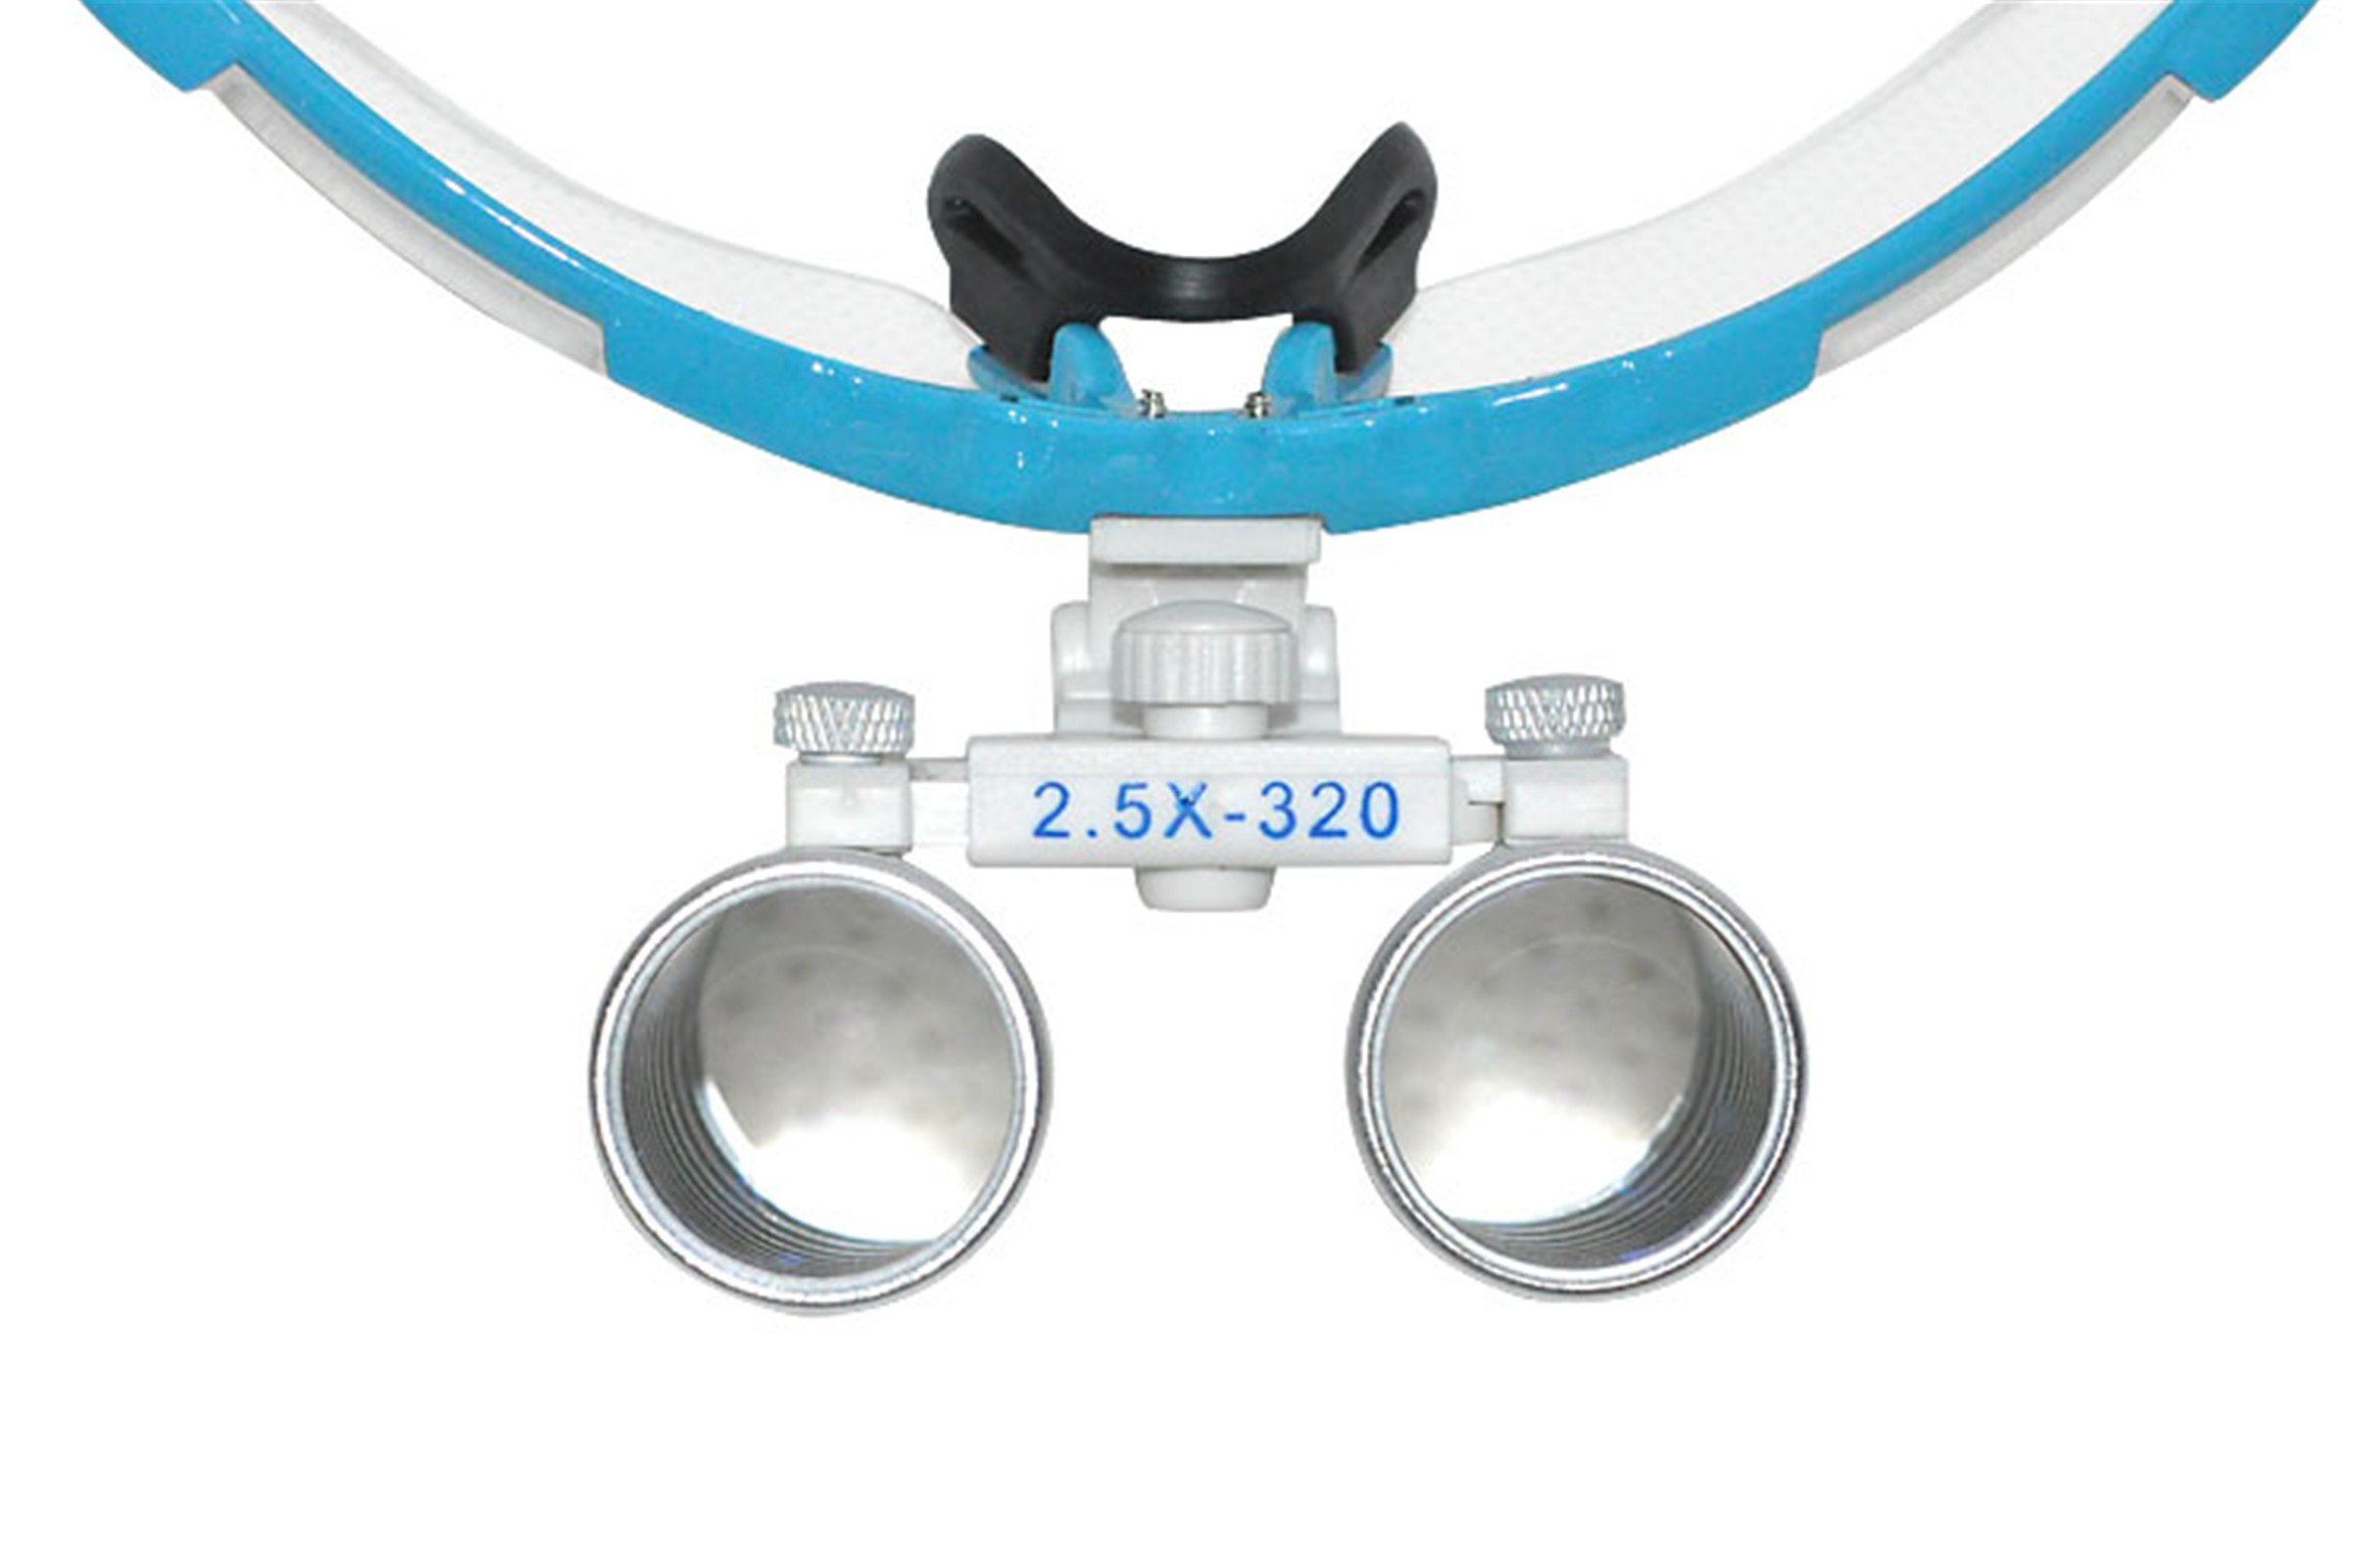 Denshine Kits Médico Quirúrgico Dental Gafas Lupas Binoculares 2.5×320MM(Azul)